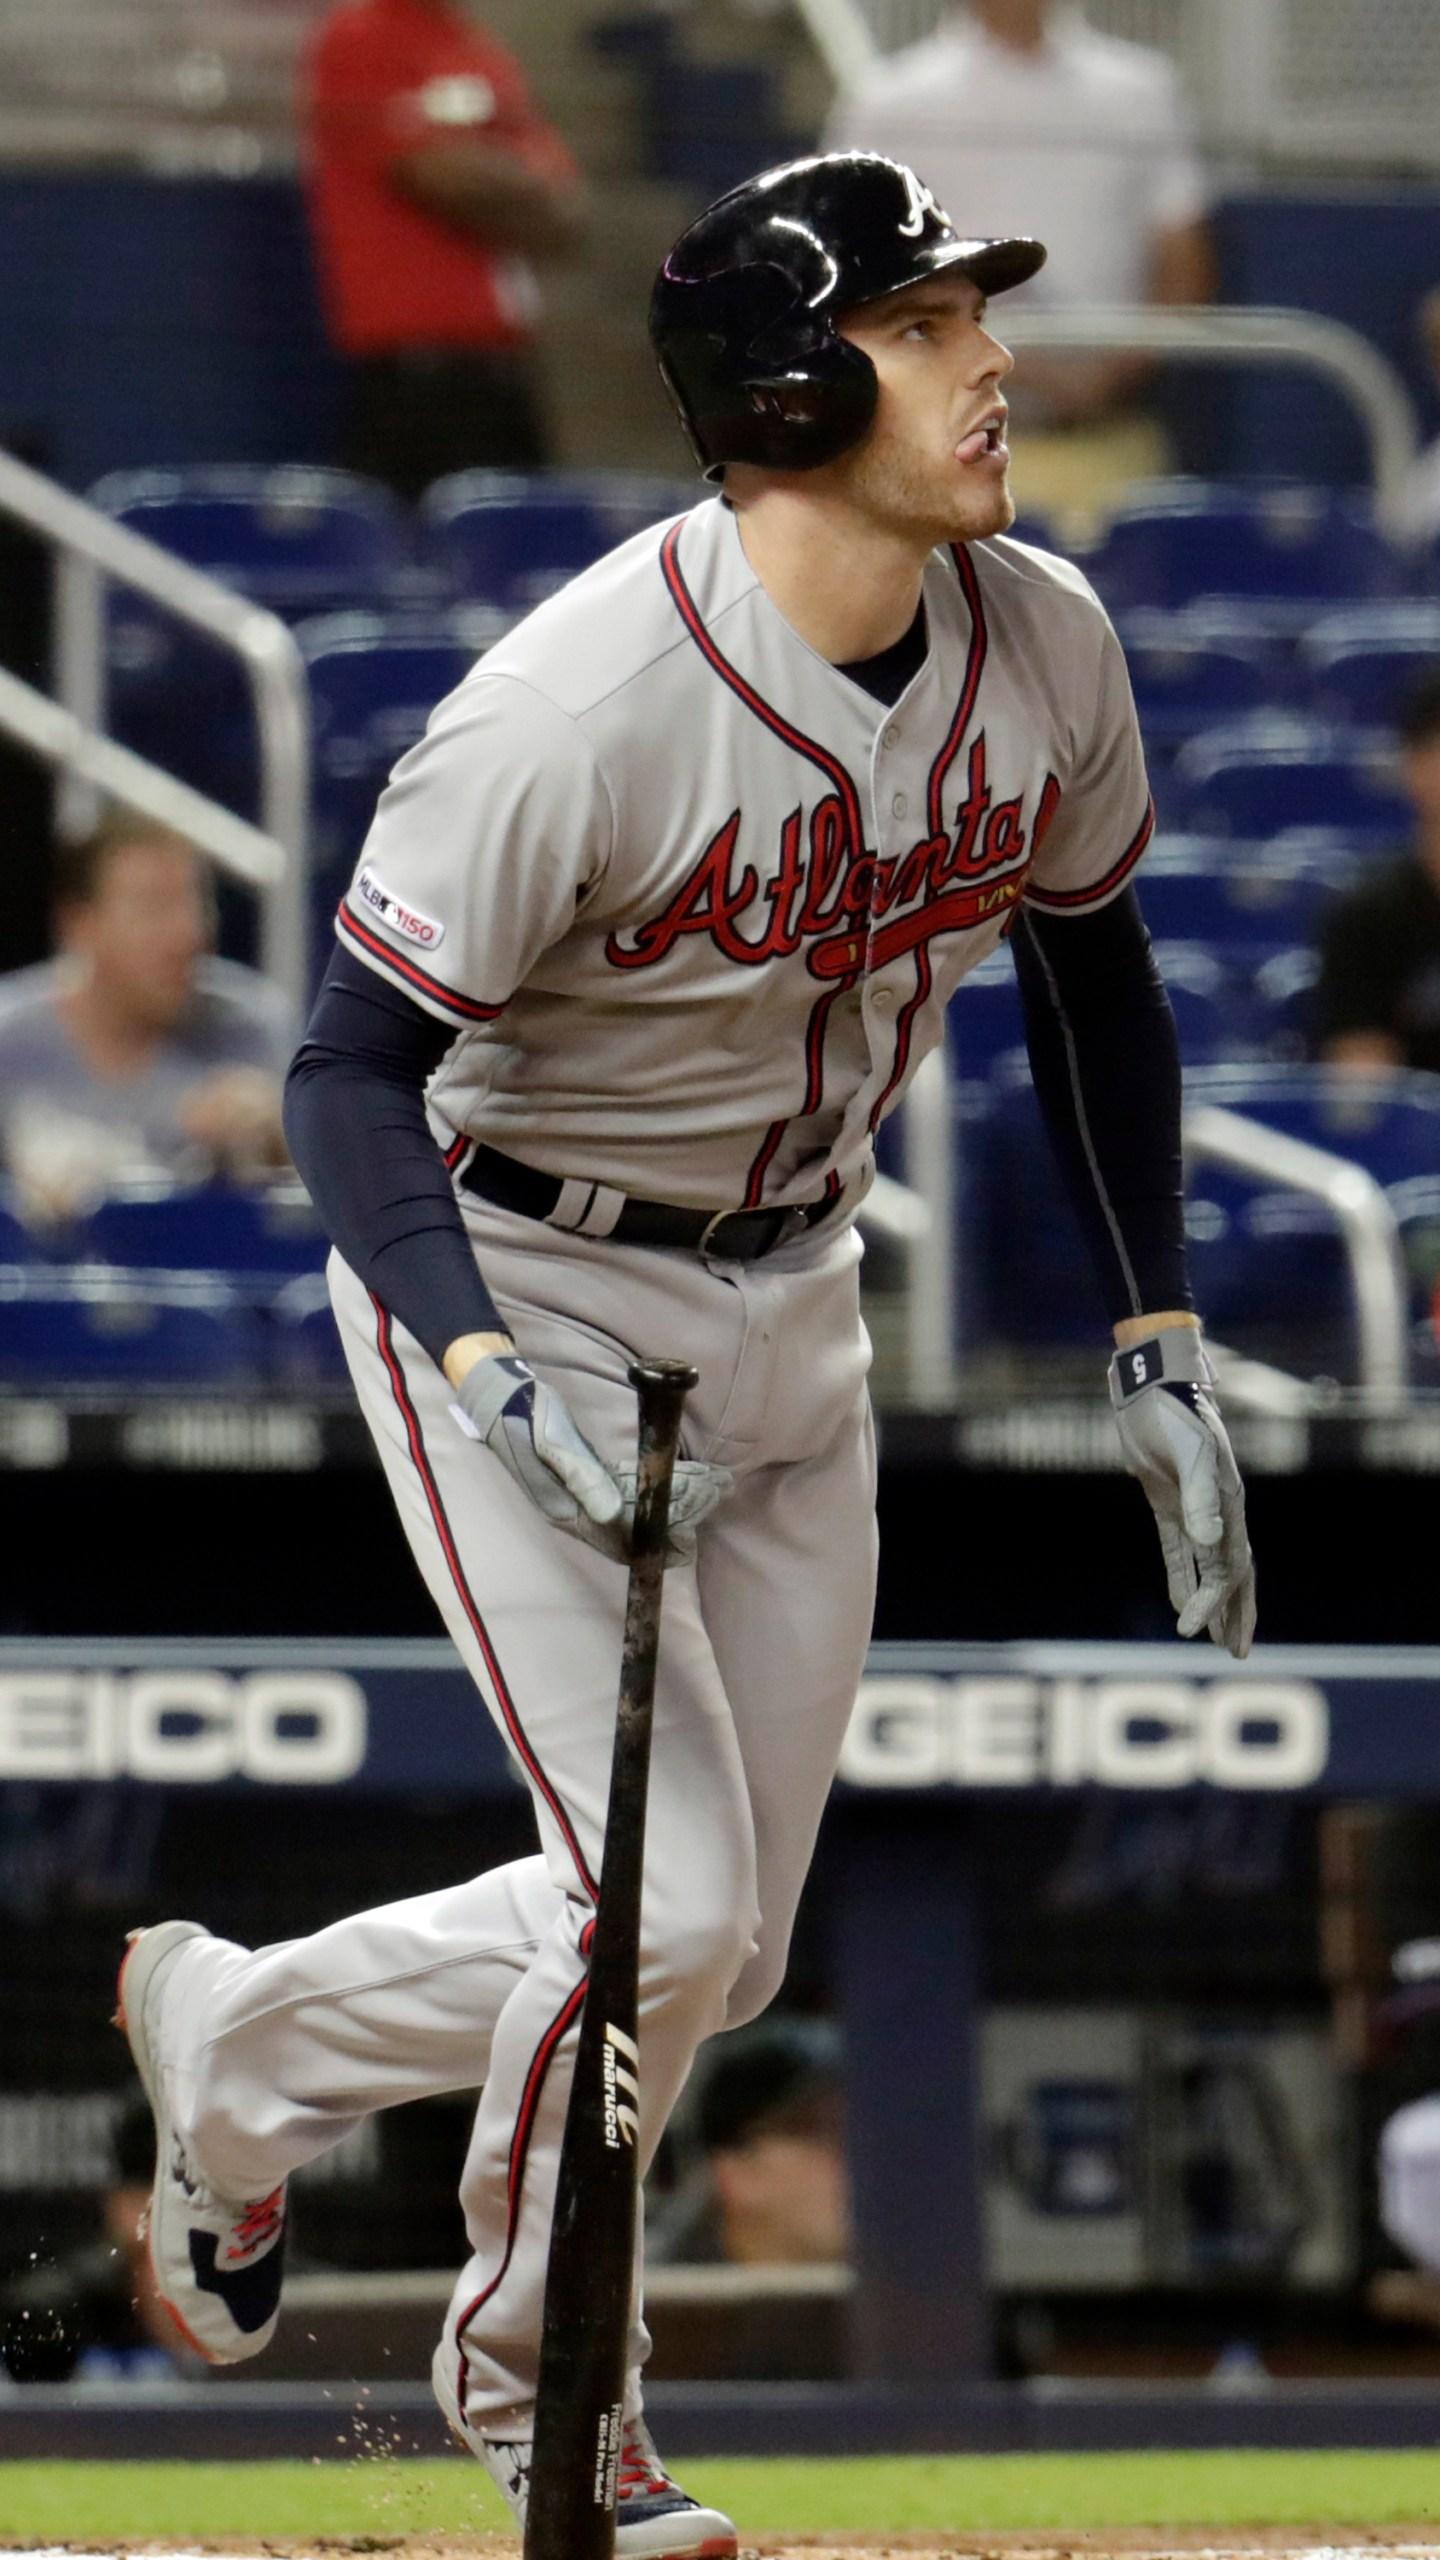 Braves_Marlins_Baseball_20219-159532.jpg19708924